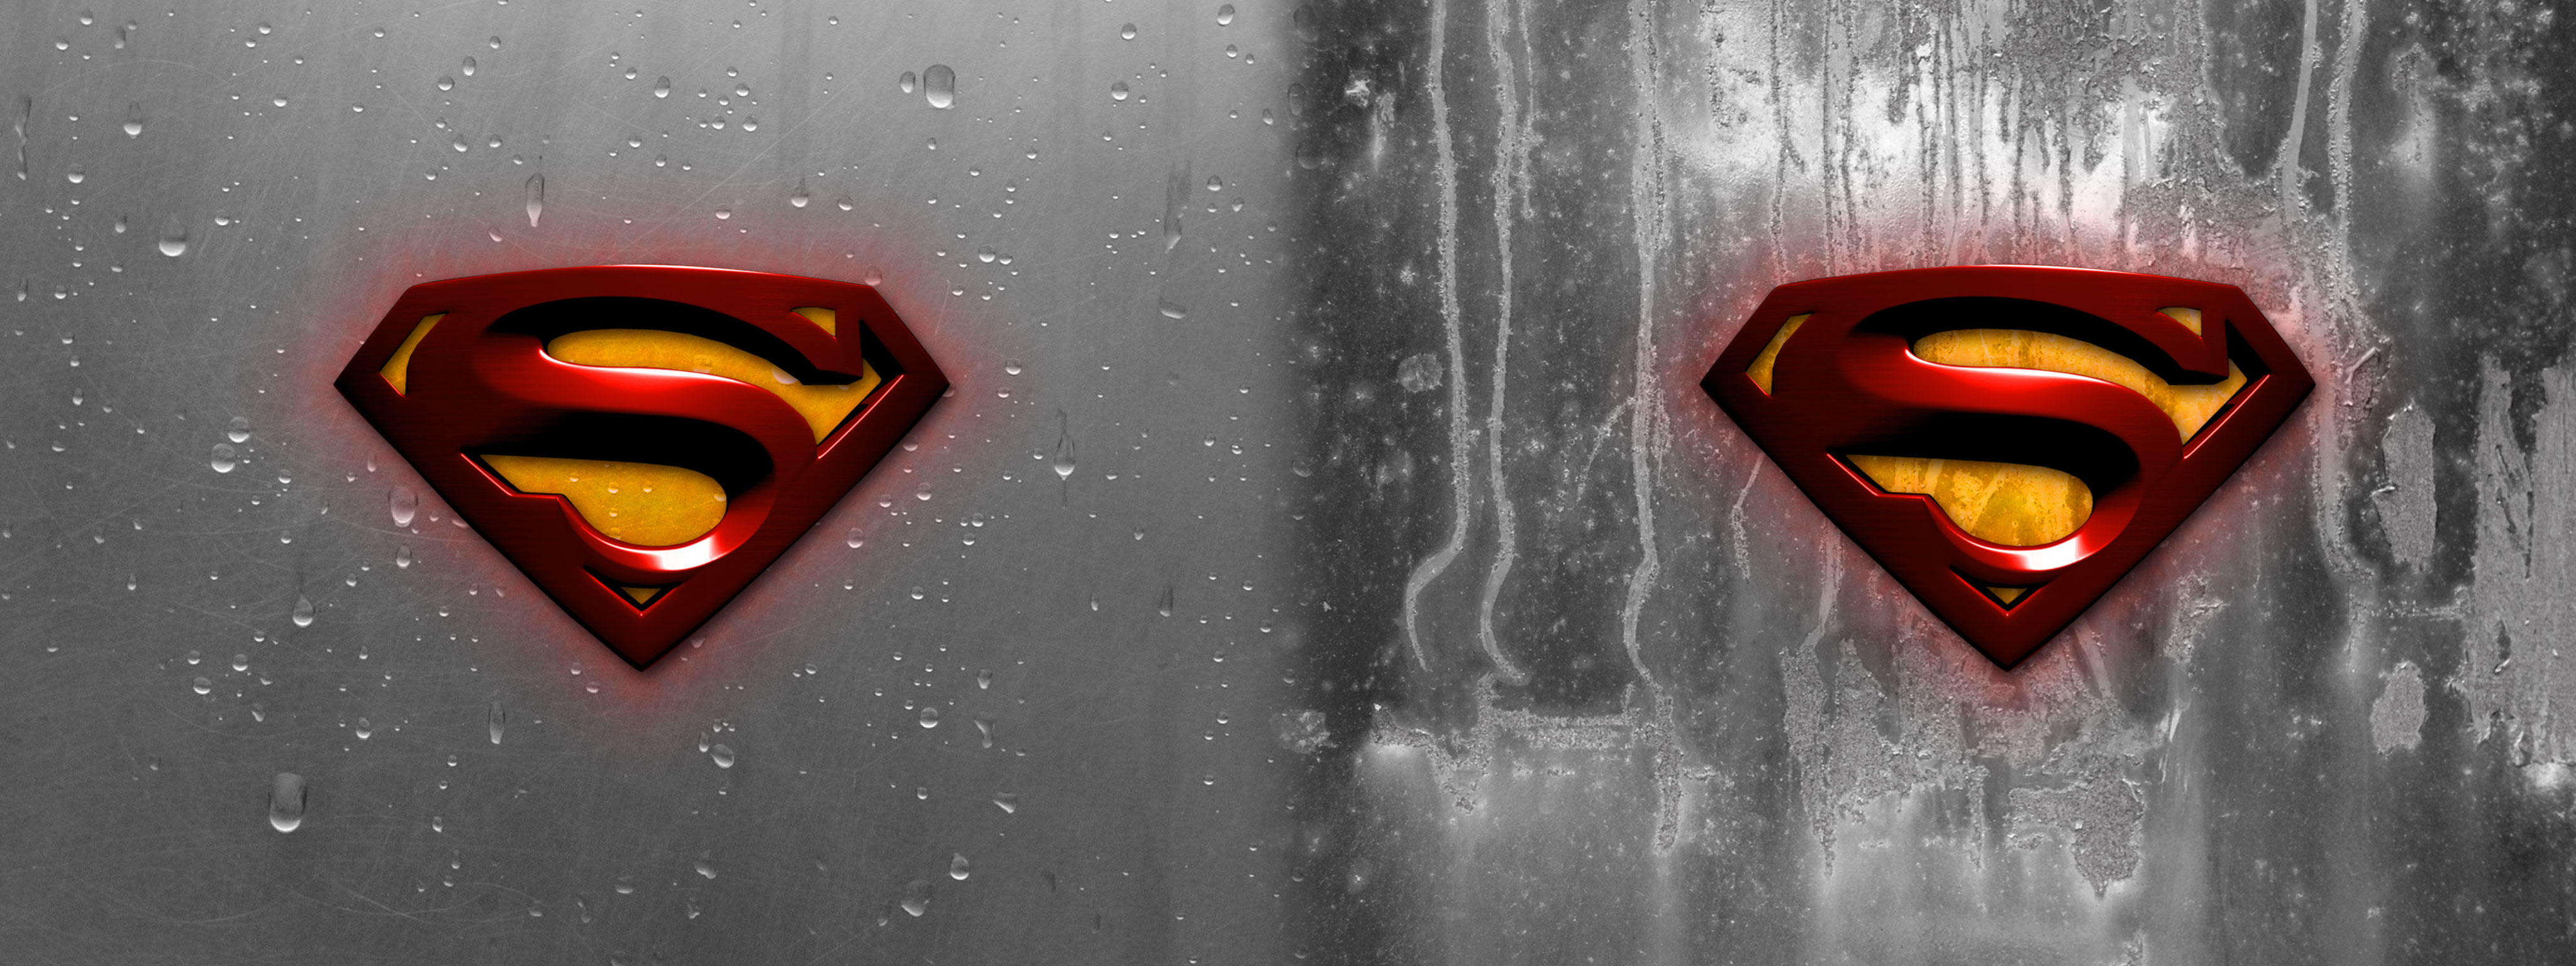 Superman Returns By Disent On Deviantart